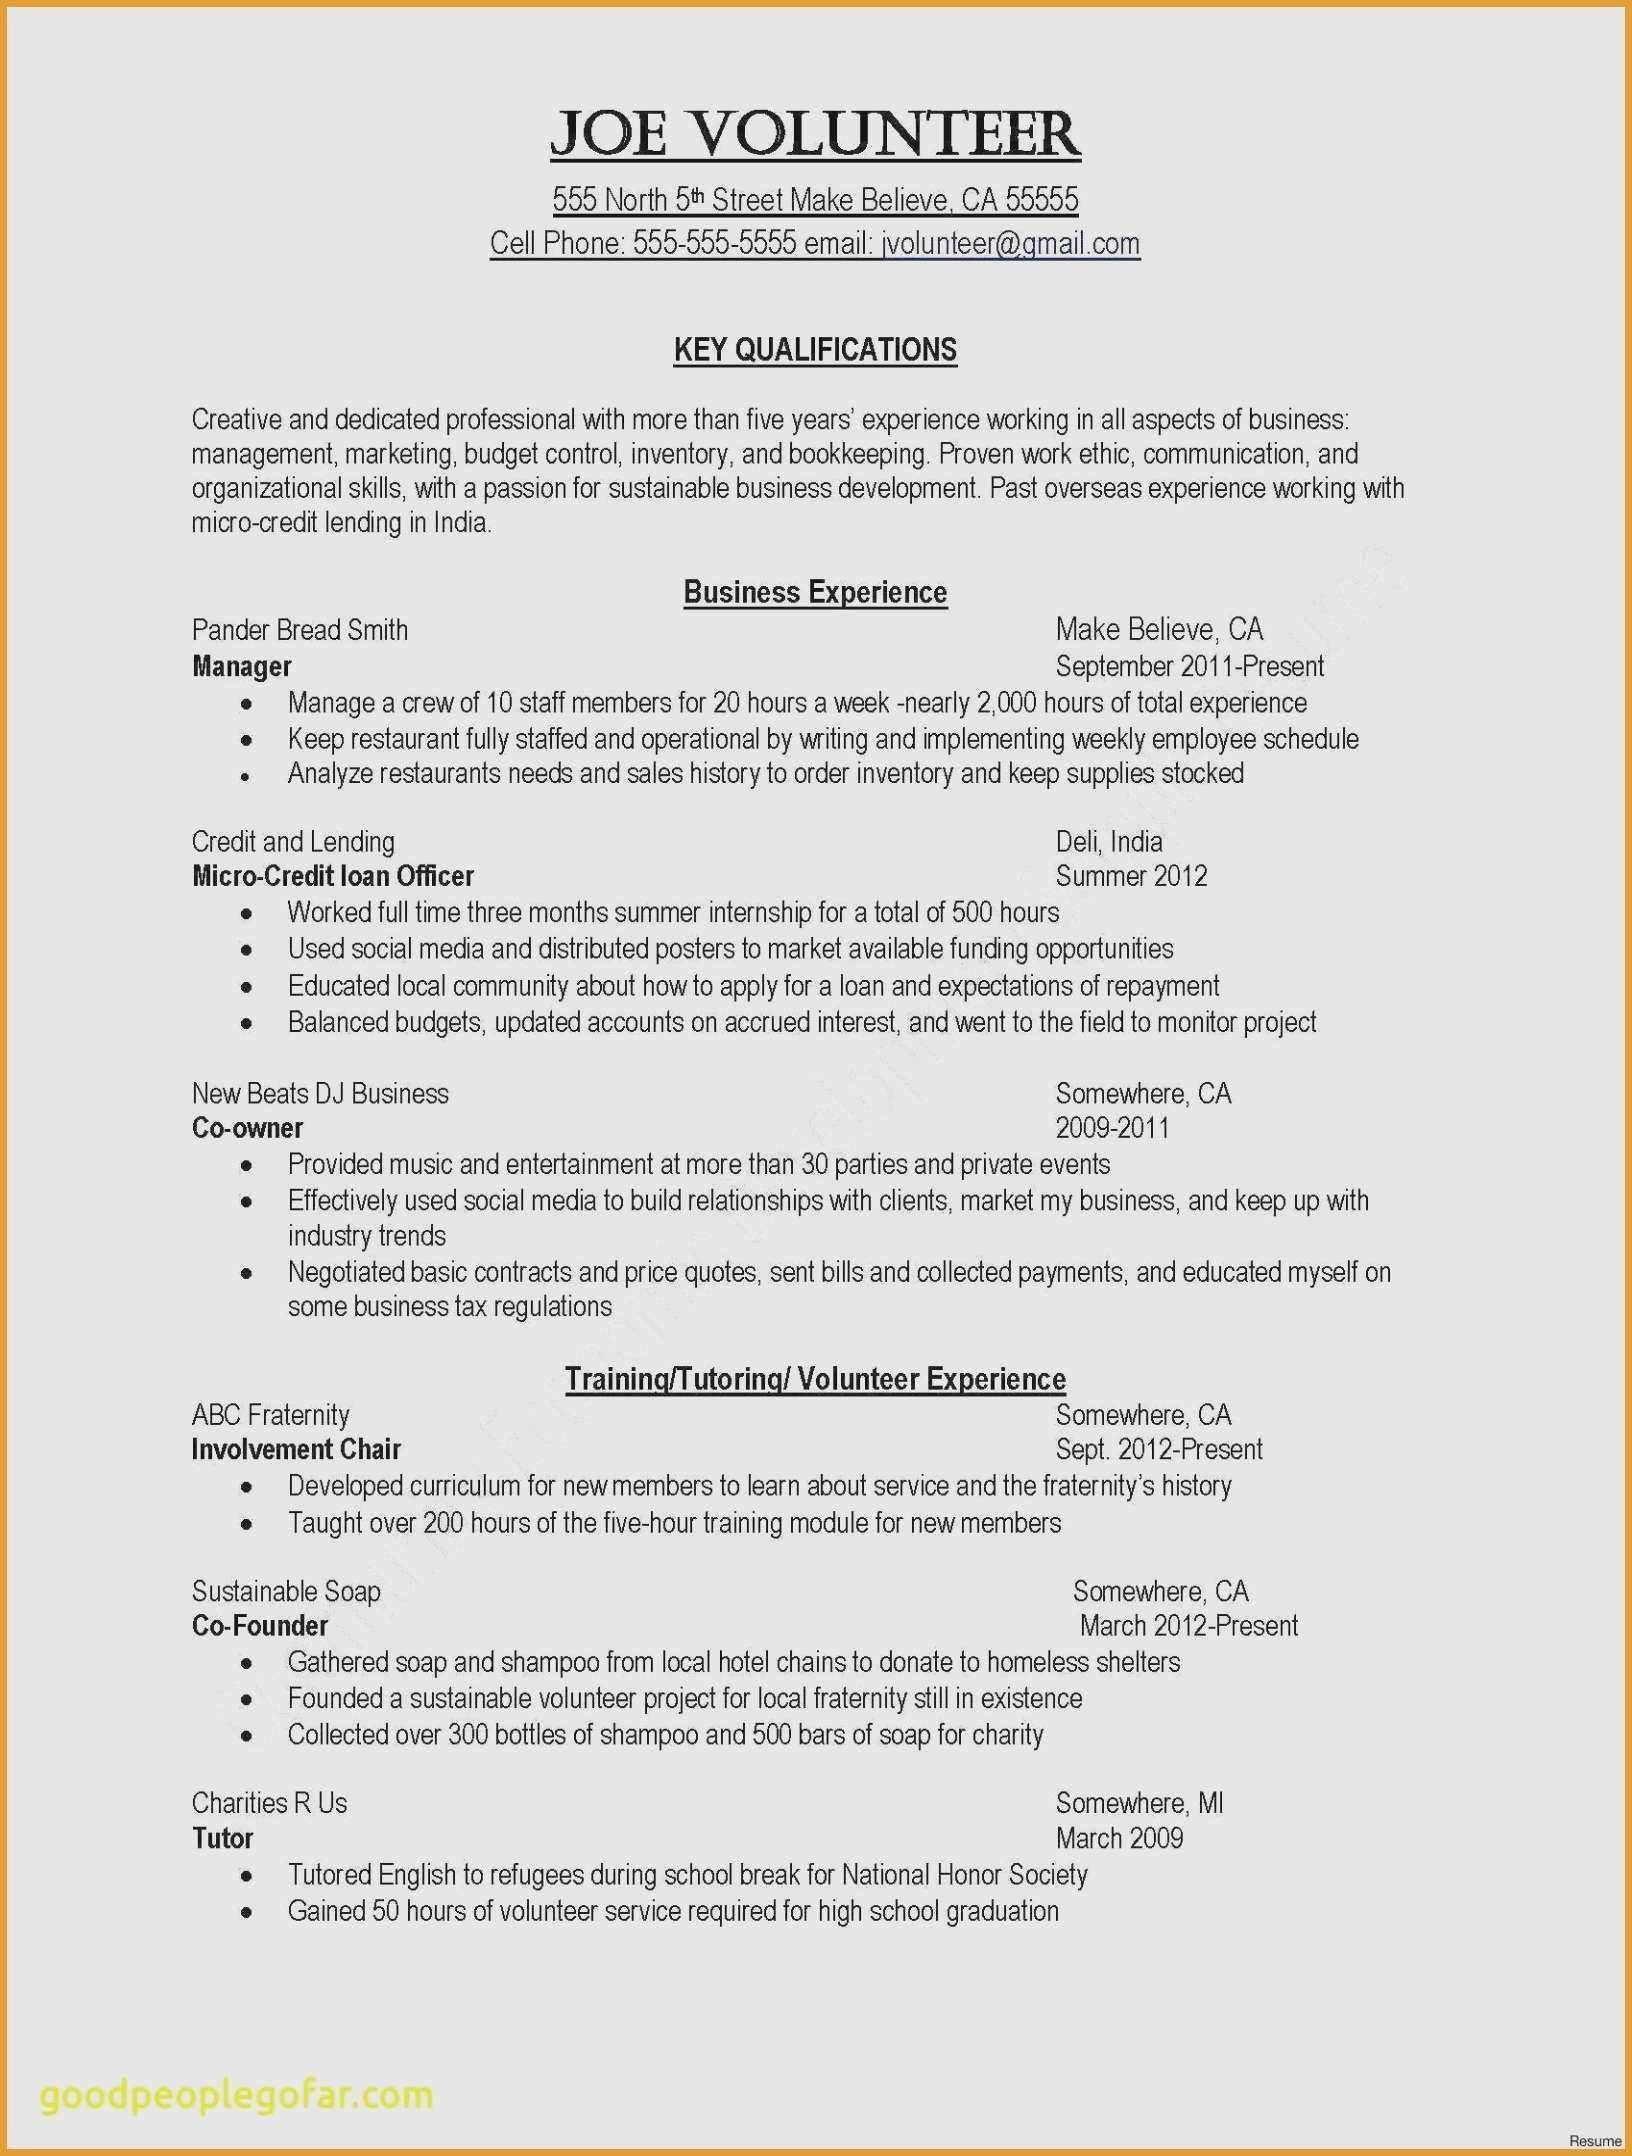 March Calendar Templates Más Reciente assessment Calendar Template Lovely Free Printable 2018 Yearly Of March Calendar Templates Más Actual Calendar Lovely Free Calendar Pages Resume Template Resume